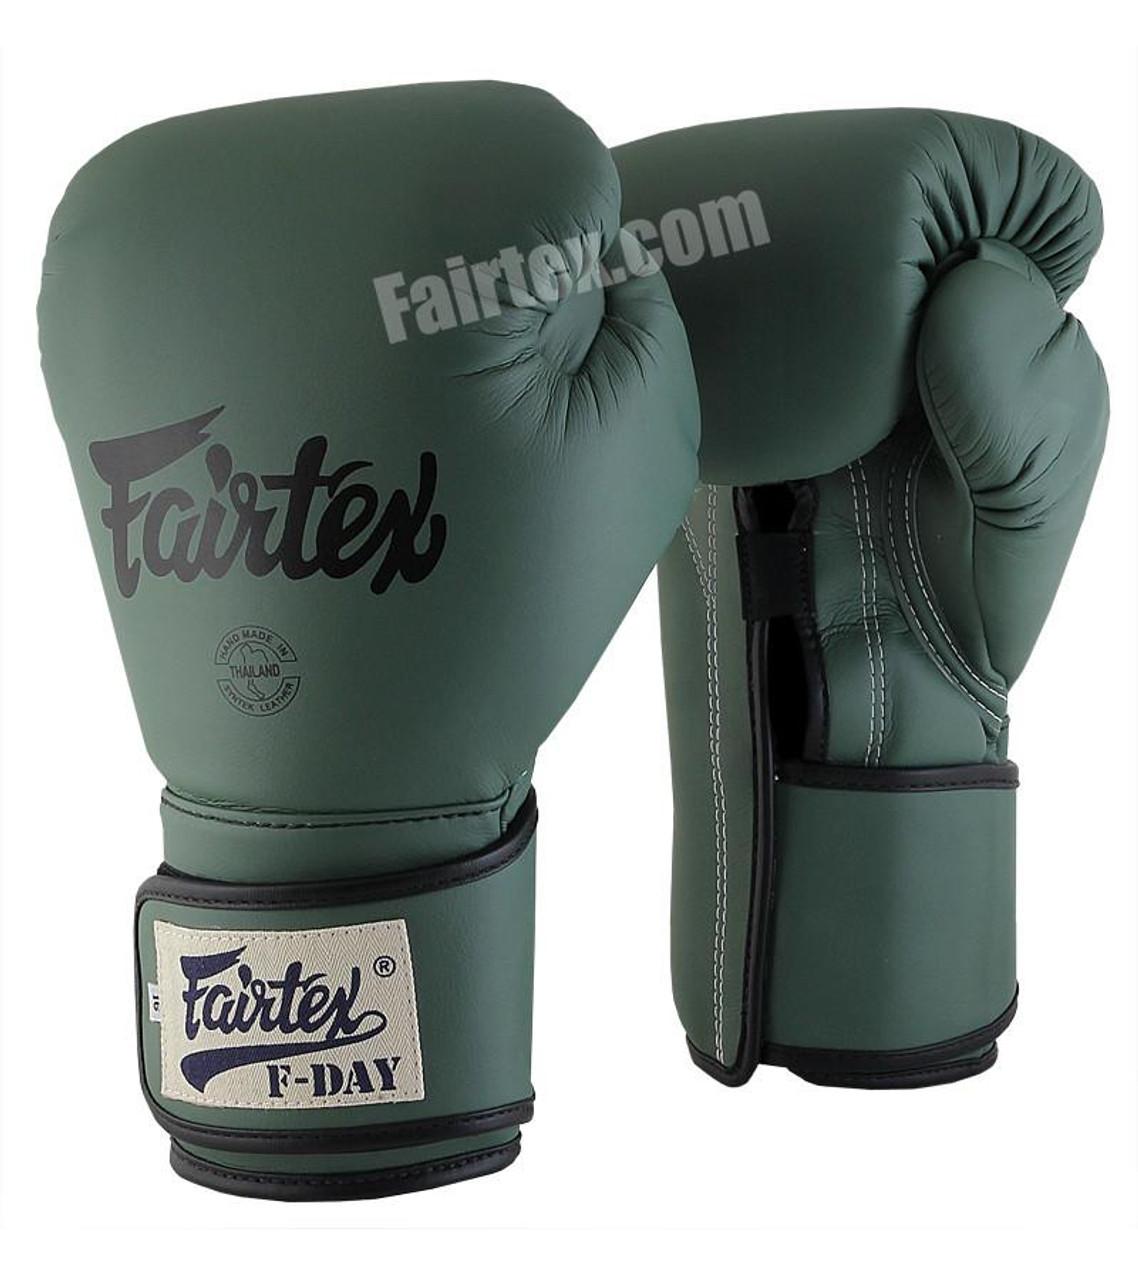 FAIRTEX GREEN FDAY LIMITED EDITION UNIVERSAL MUAY THAI/BOXING GLOVES